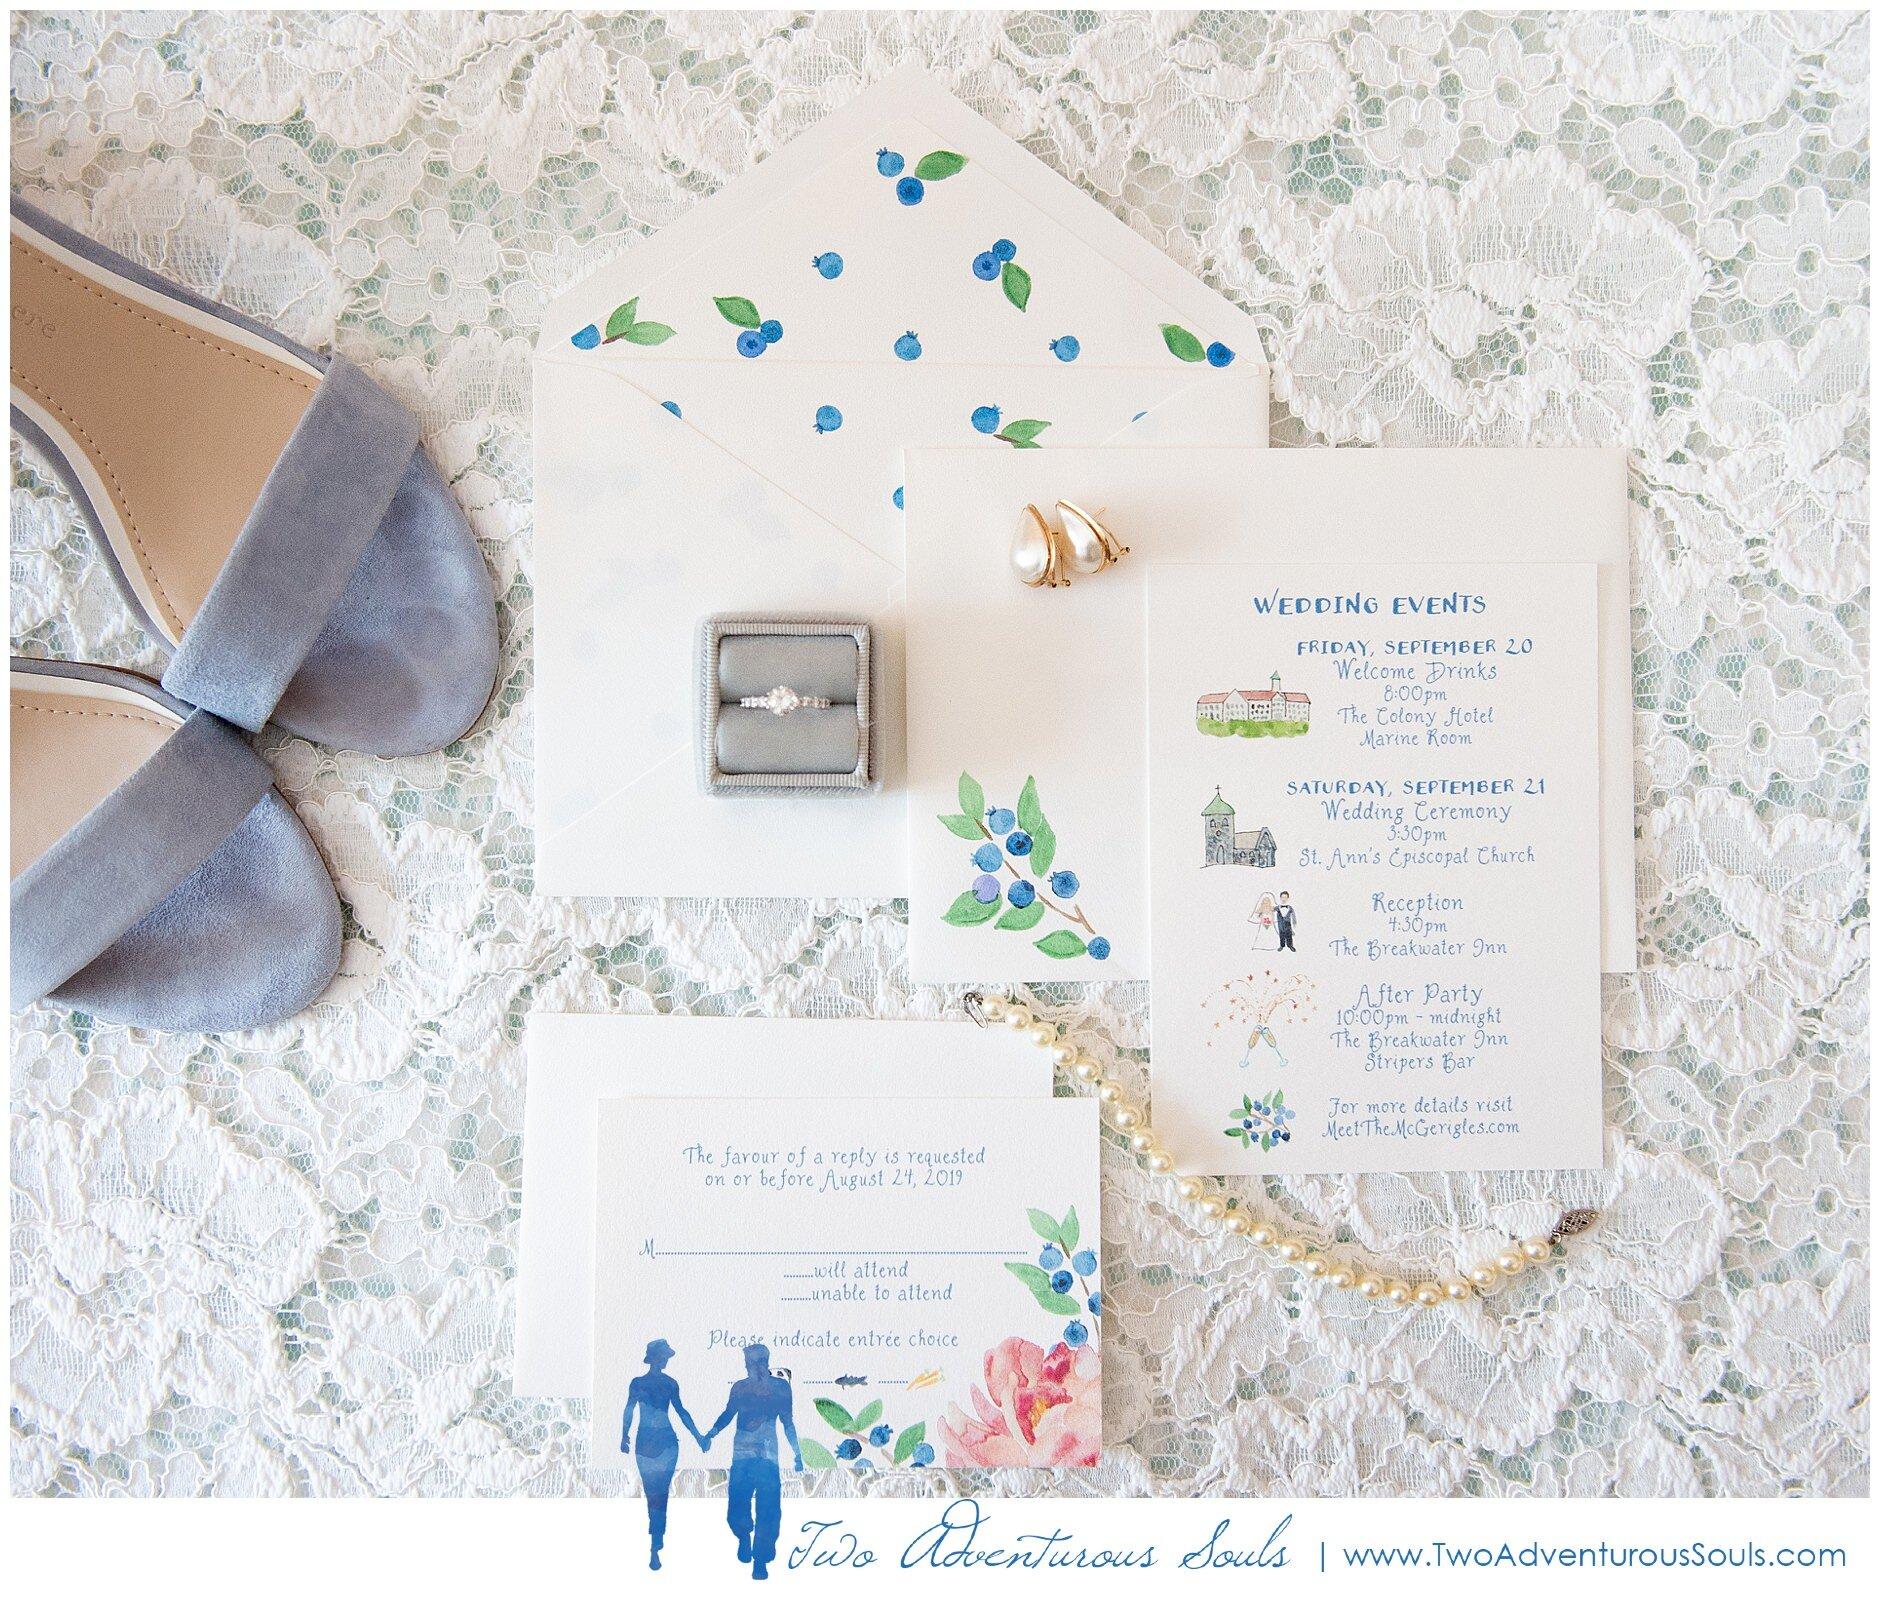 Breakwater Inn and Spa Wedding Photographers, Kennebunkport Wedding Photographers, Two Adventurous Souls- 092119_0001.jpg